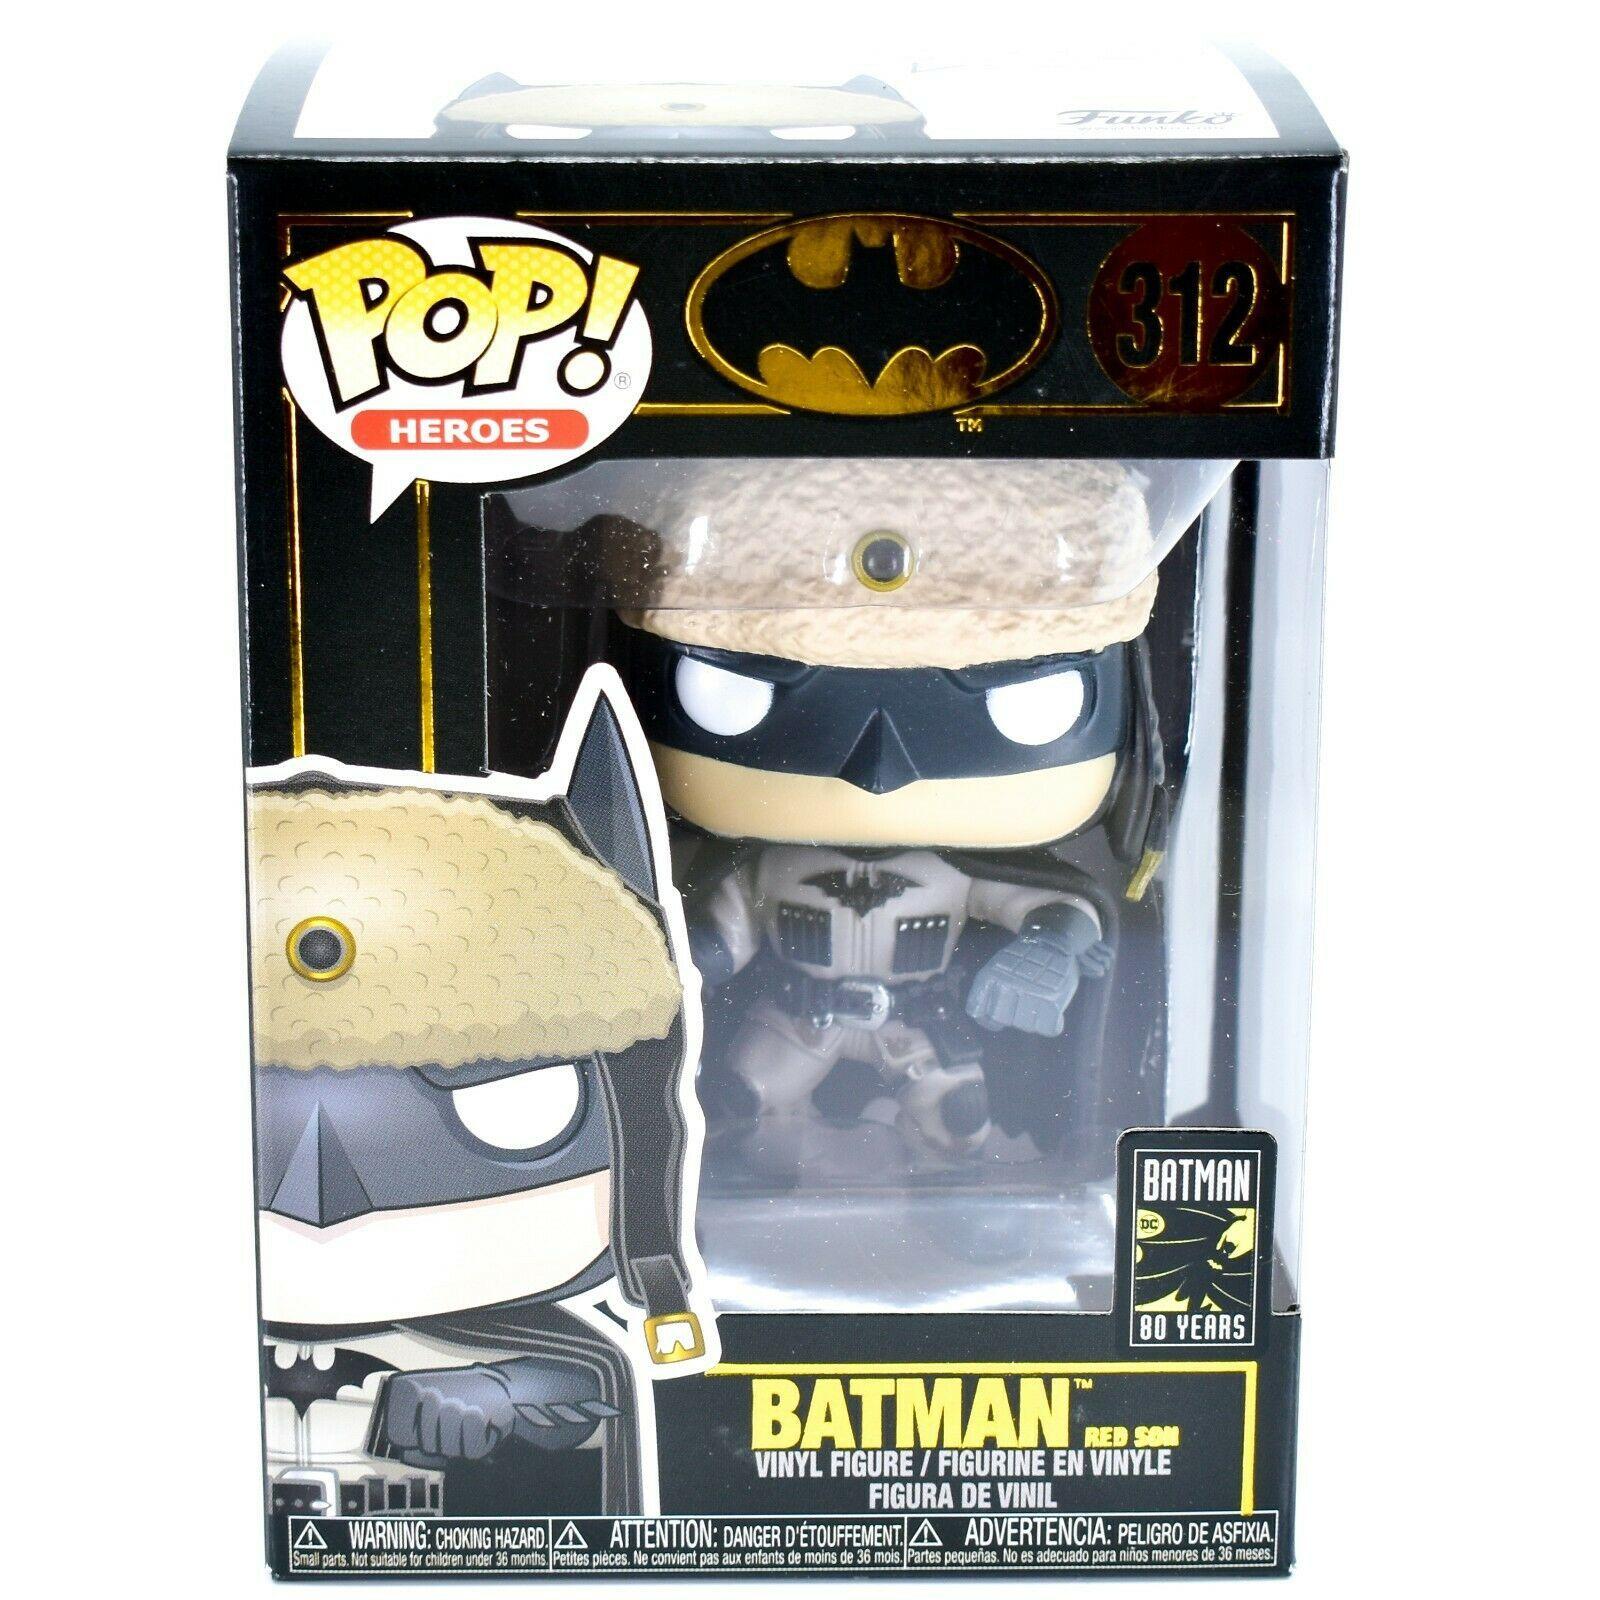 Funko Pop! Heroes 2003 Batman Red Son 80 Years Anniversary Vinyl Figure #312